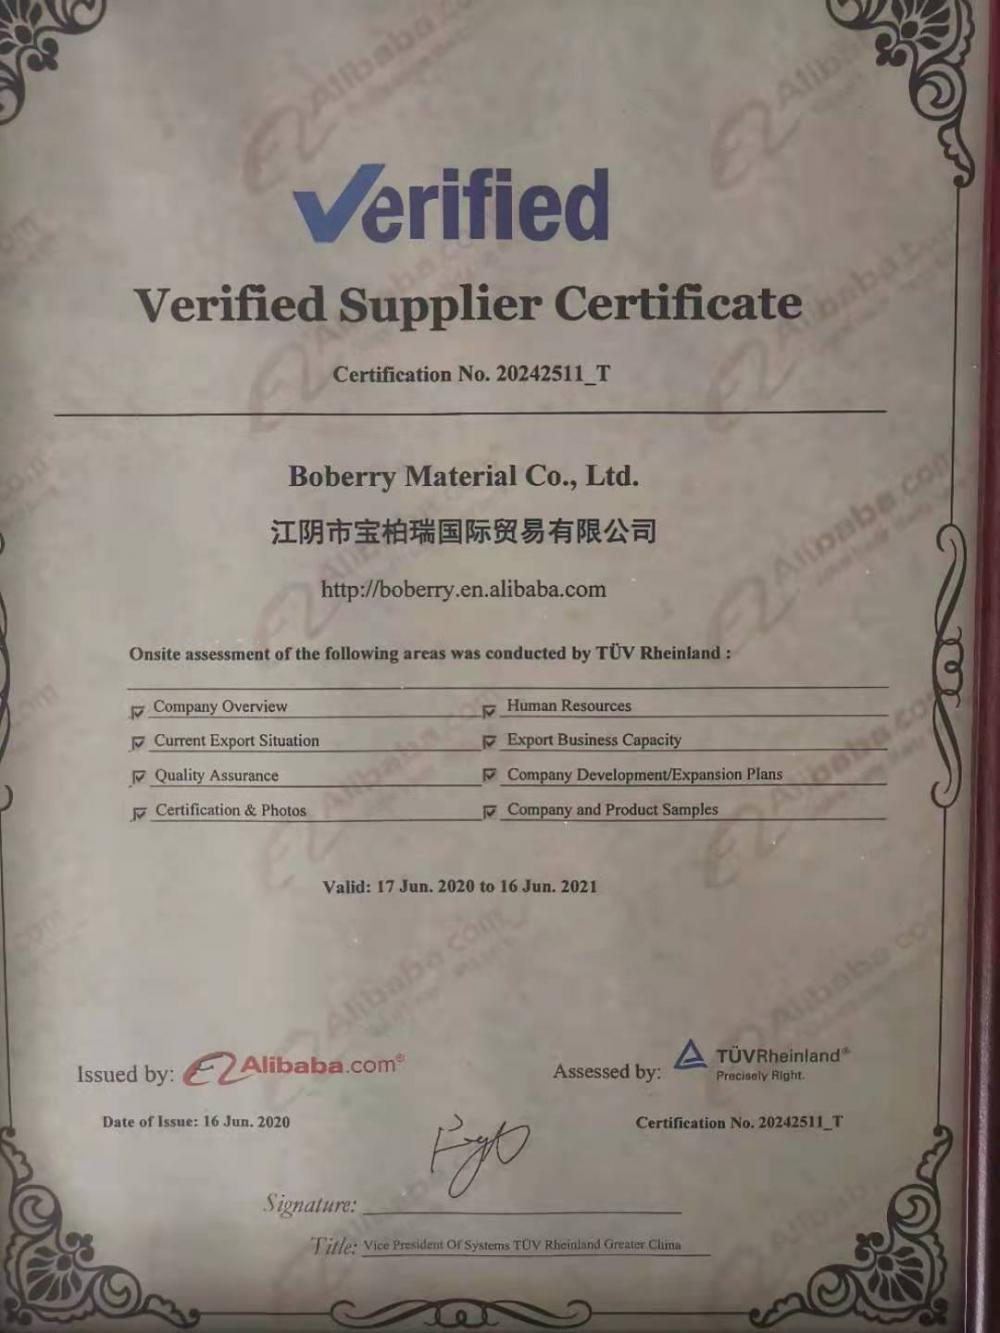 TUV verified supplier certificate